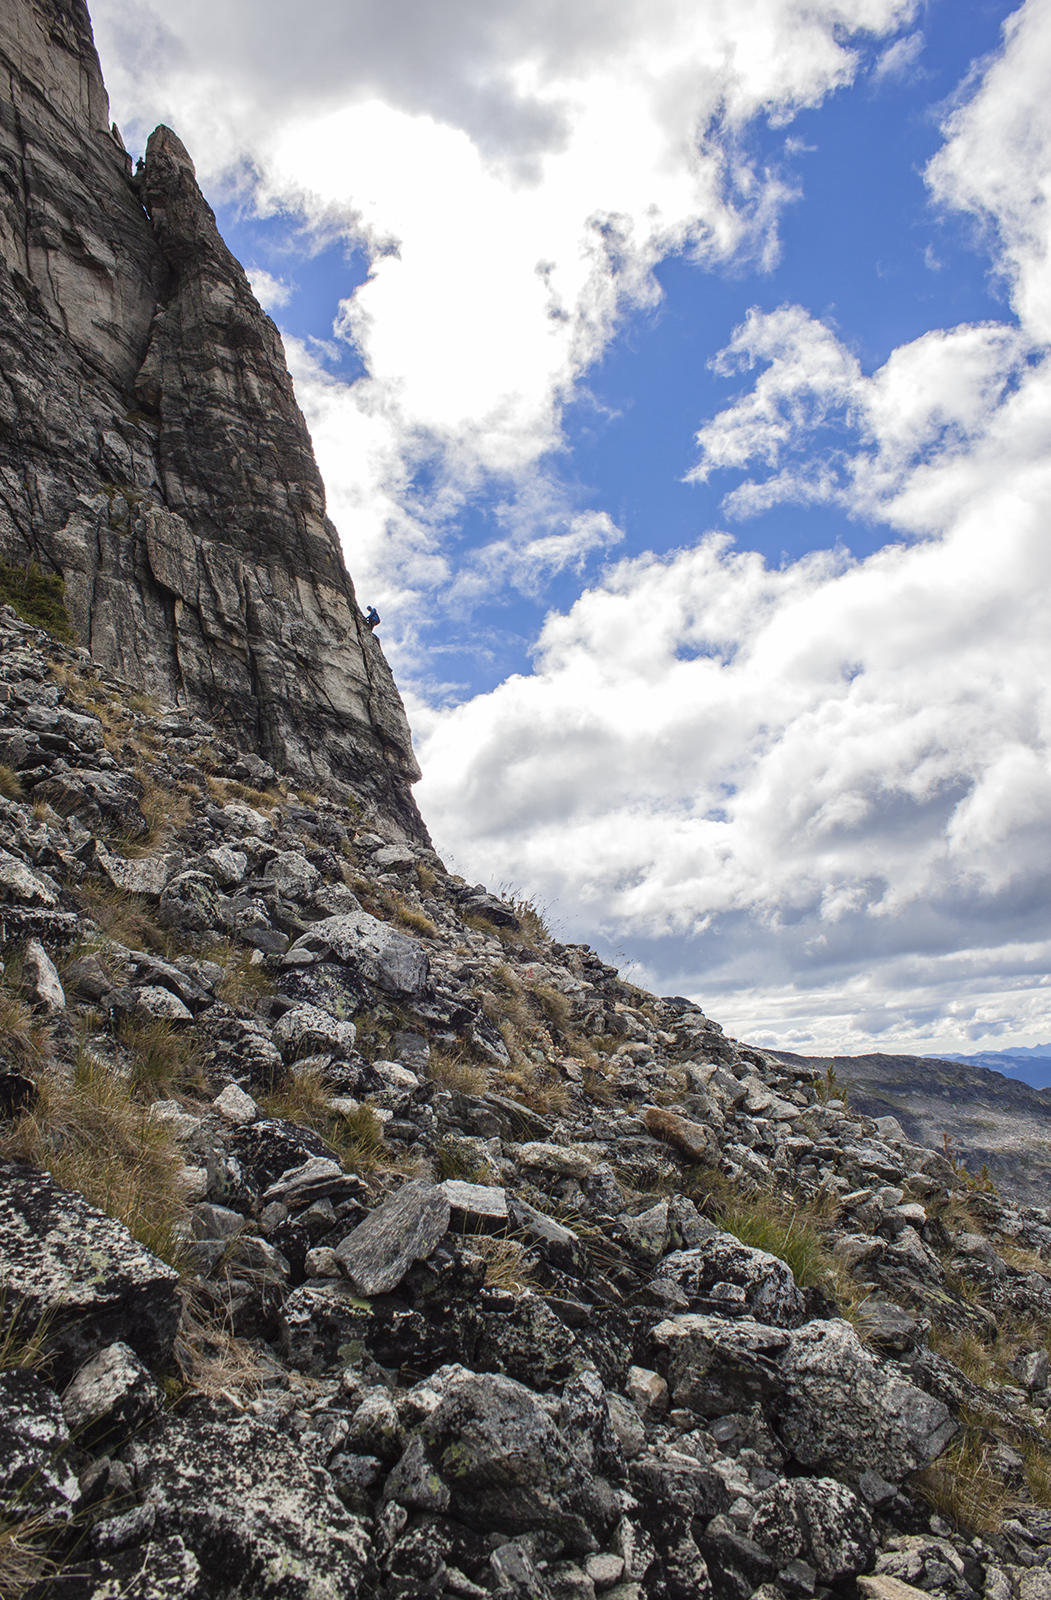 A man climbs up a sheer rock face.